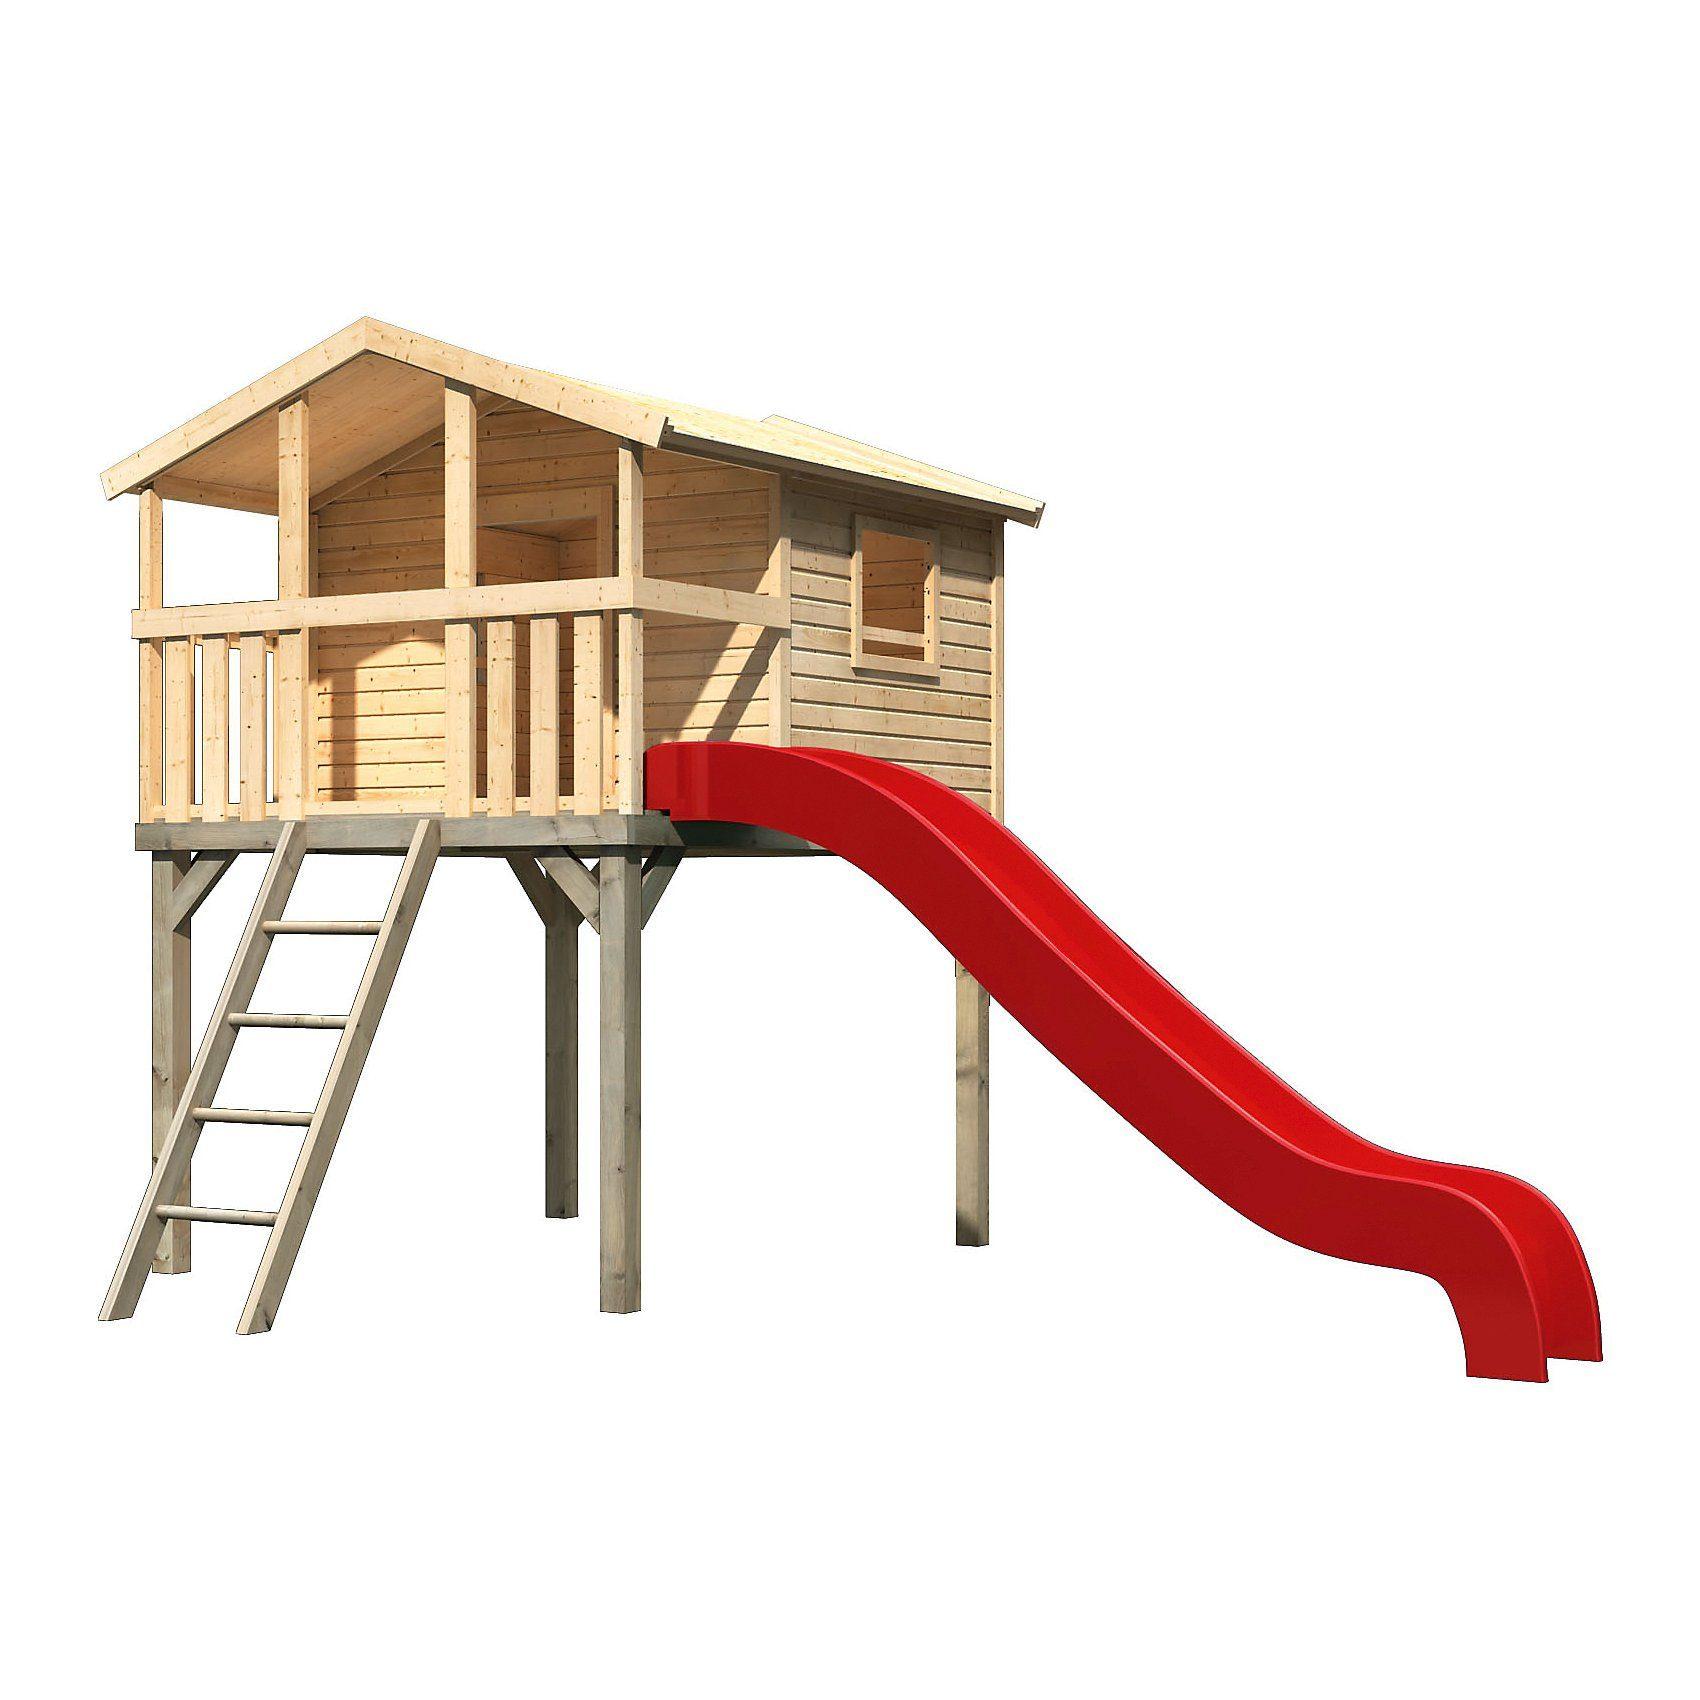 Karibu Stelzenhaus Benjamin im Set mit Rutsche rot